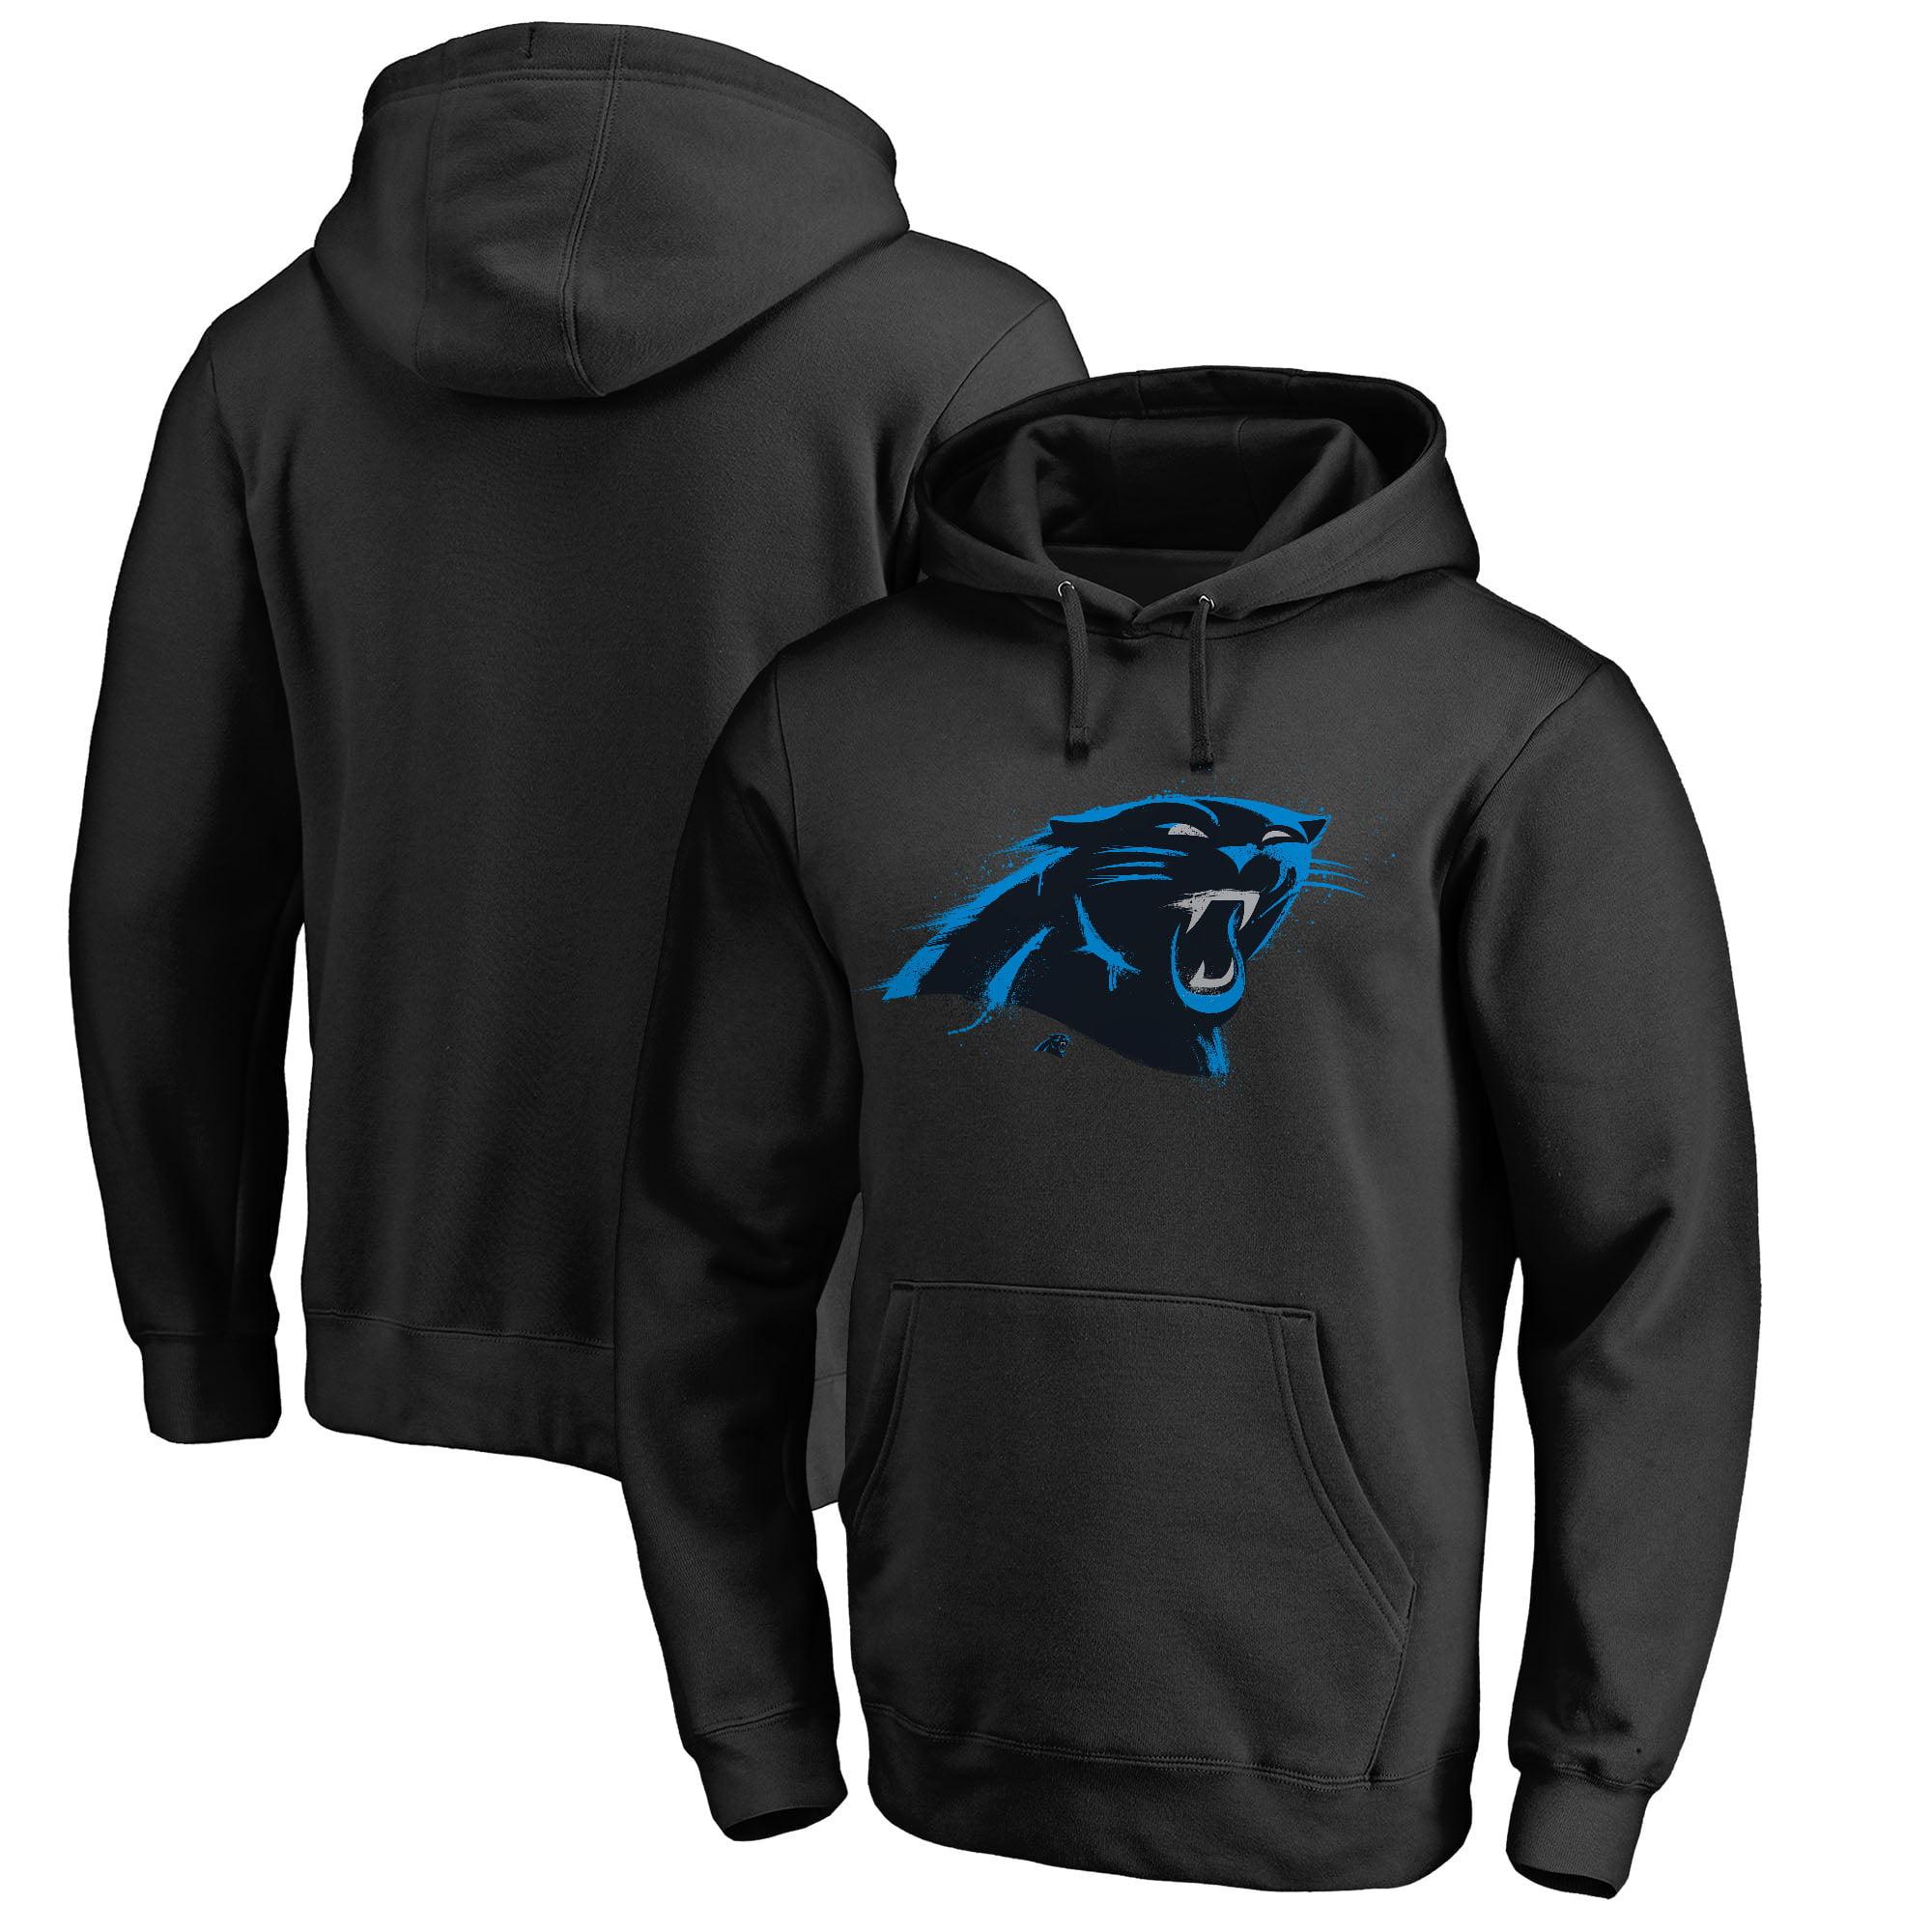 Carolina Panthers NFL Pro Line by Fanatics Branded Splatter Logo Pullover Hoodie - Black